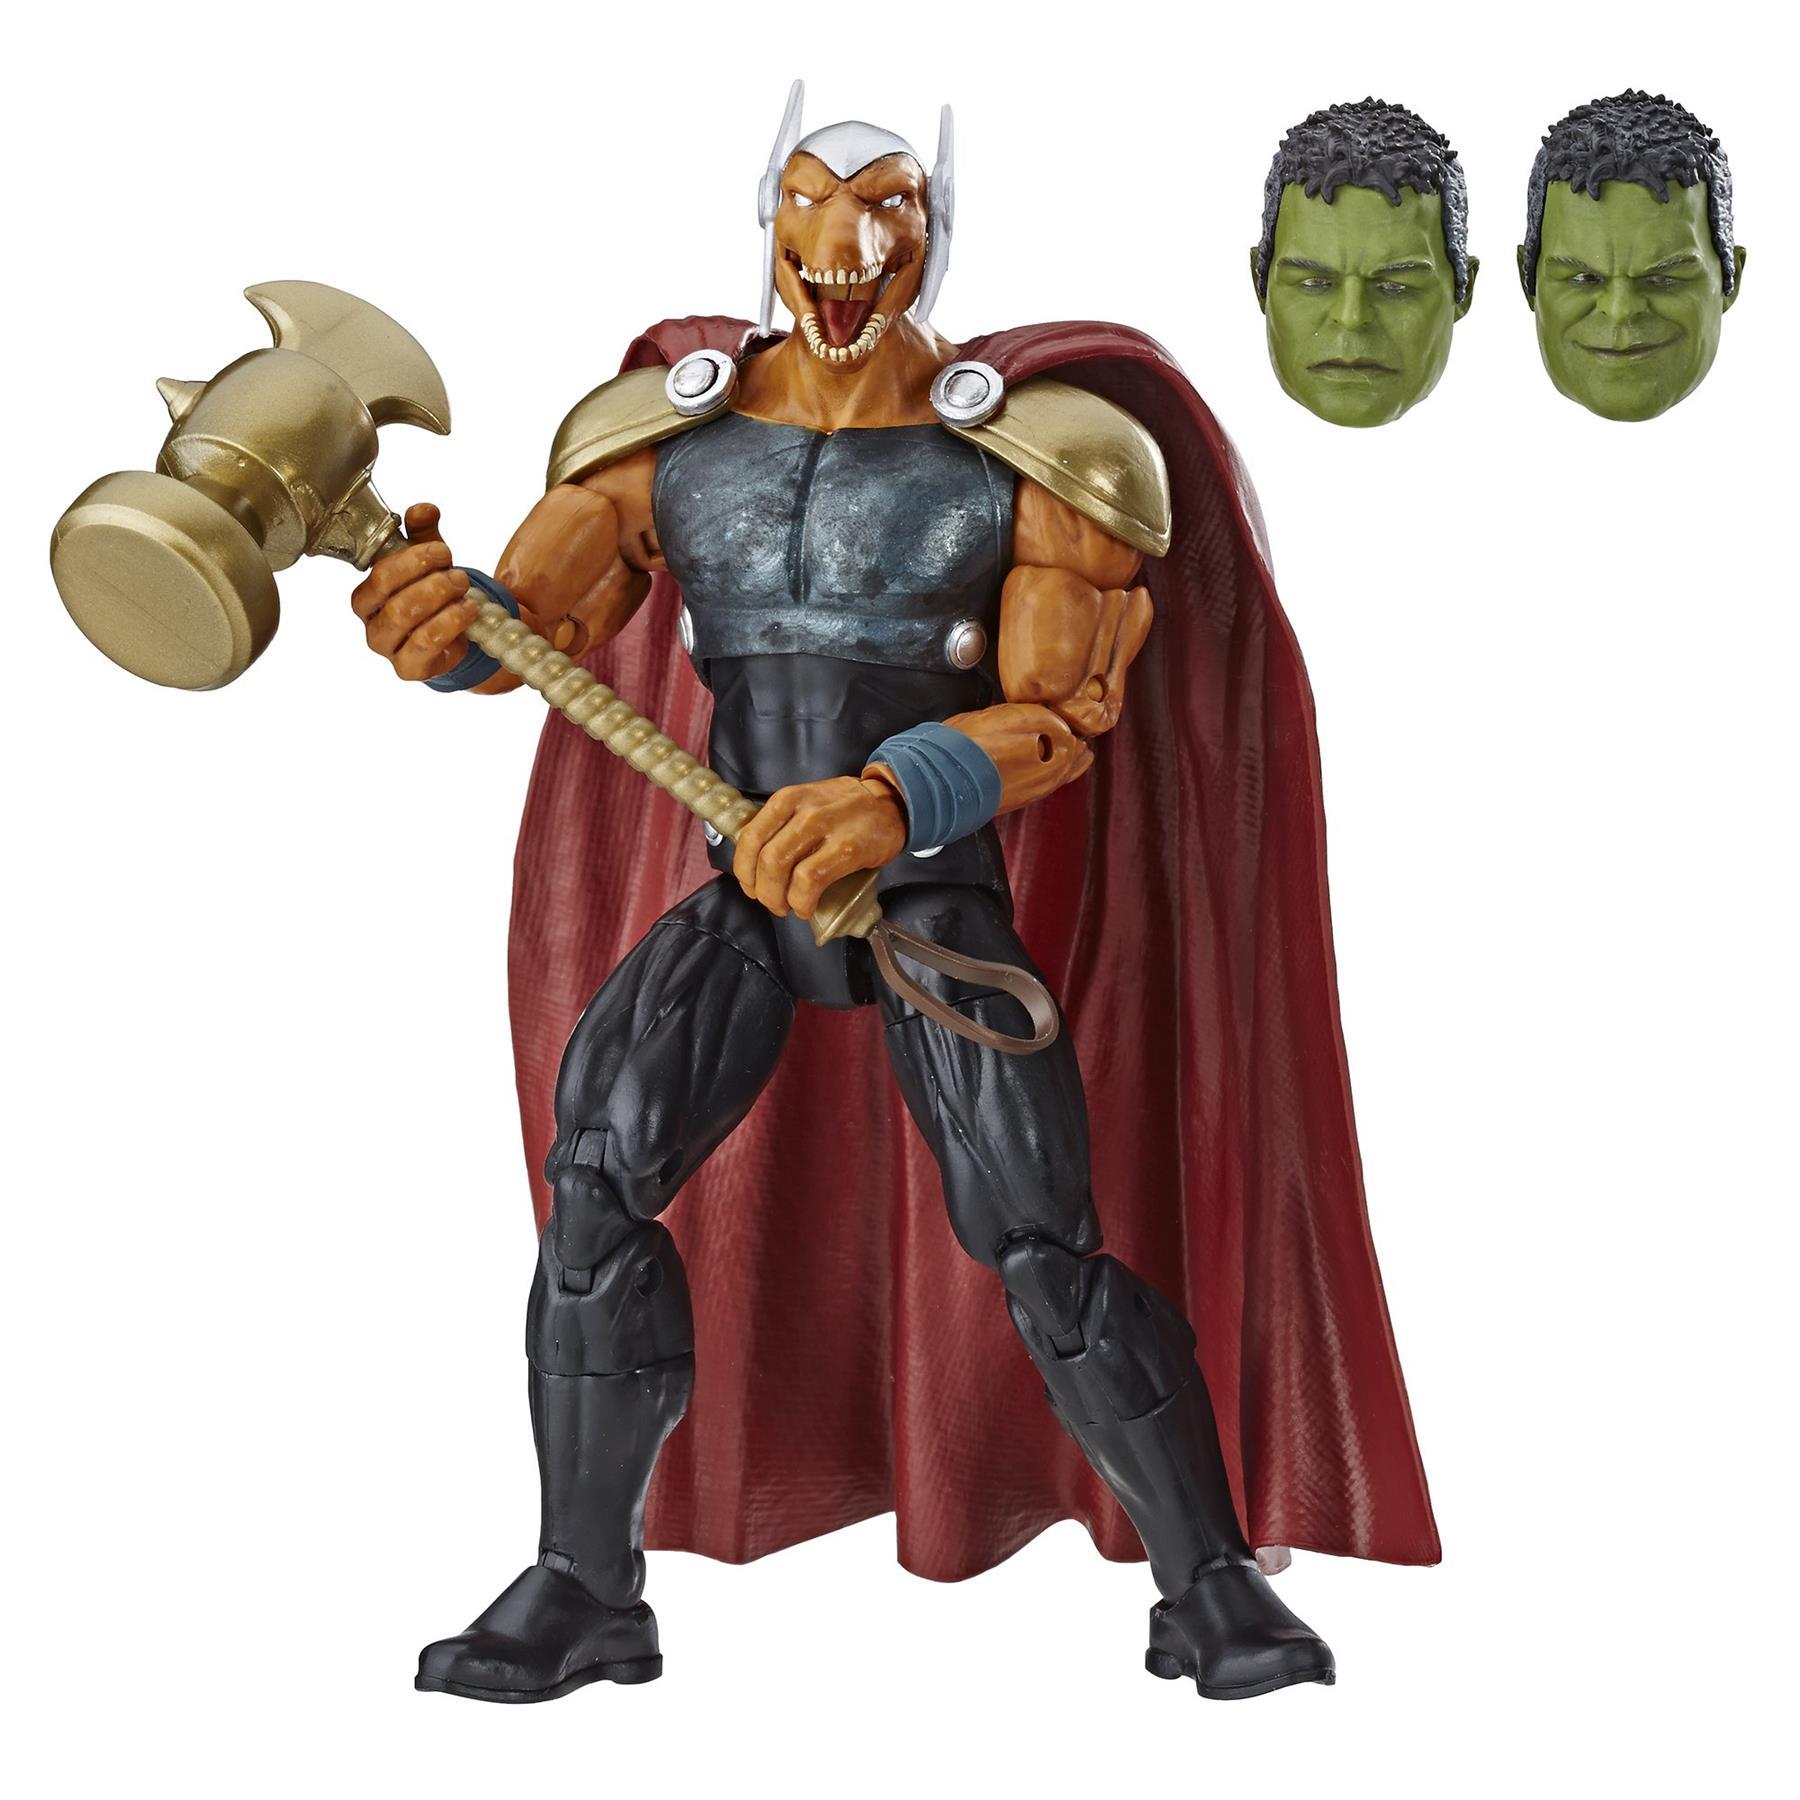 Marvel-Legends-Avengers-6-034-Action-Figures-Hulk-BAF thumbnail 3